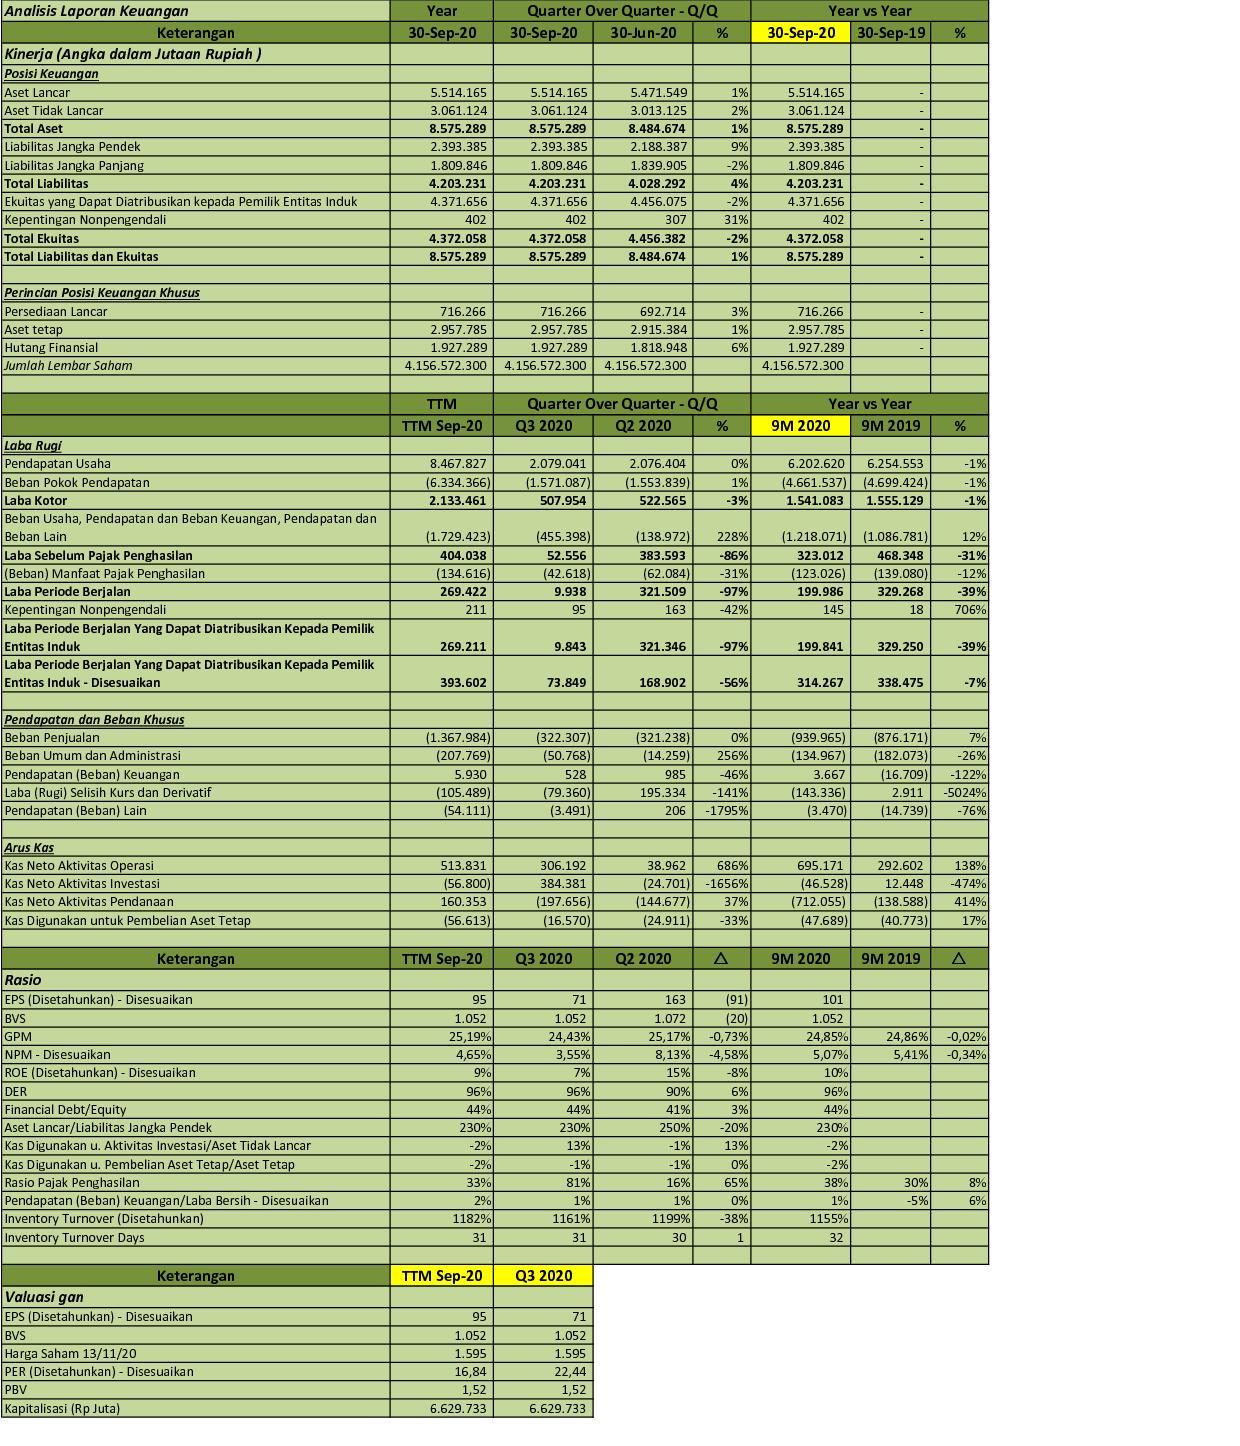 Idx Investor Ucid Q3 2020 Pt Uni Charm Indonesia Tbk Analisis Laporan Keuangan